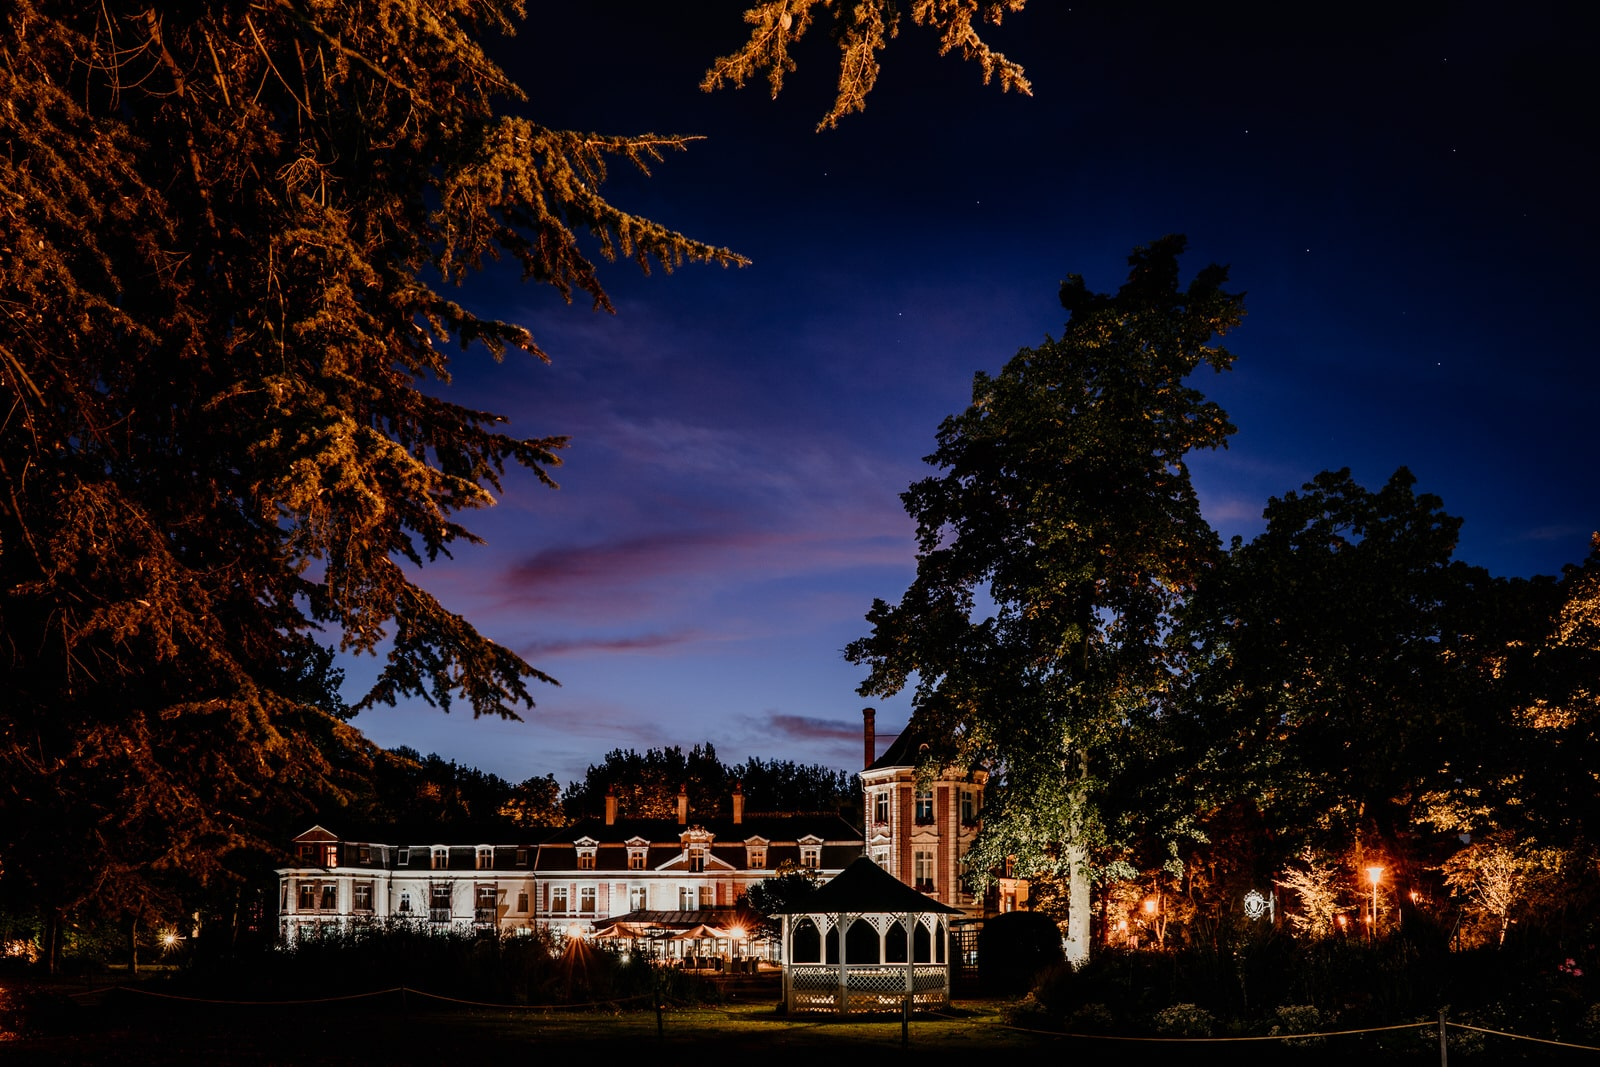 Chateau de Beaulieu nuit